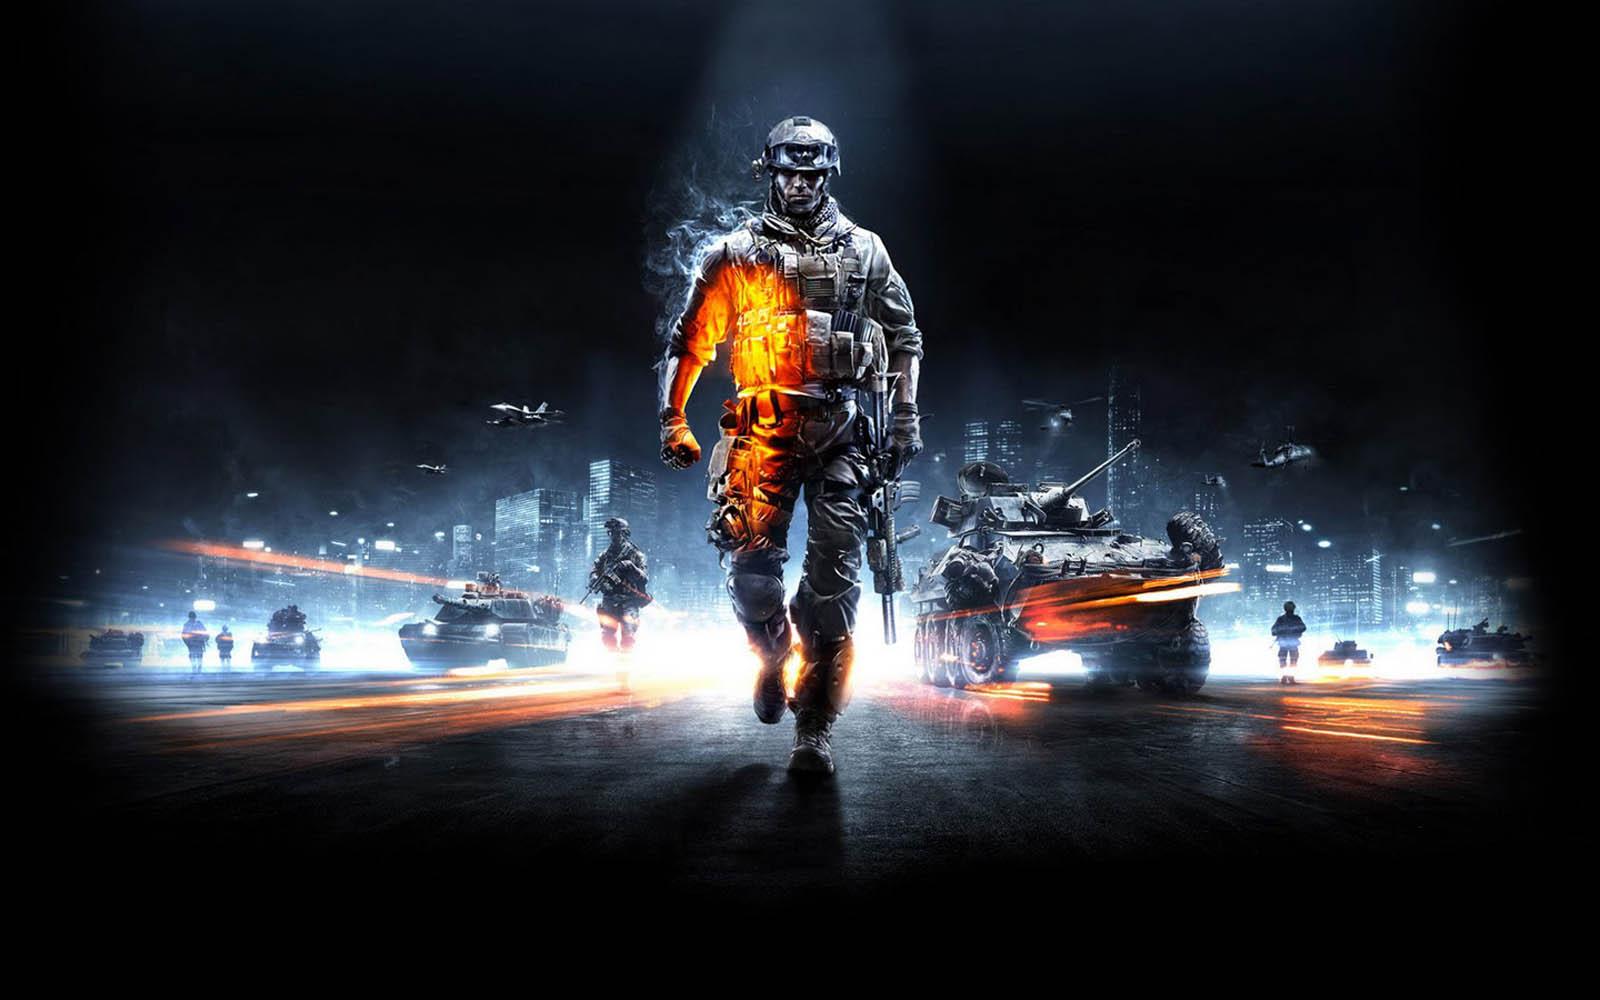 image screensaver Battlefield 3 Game Desktop Wallpapers 1600x1000